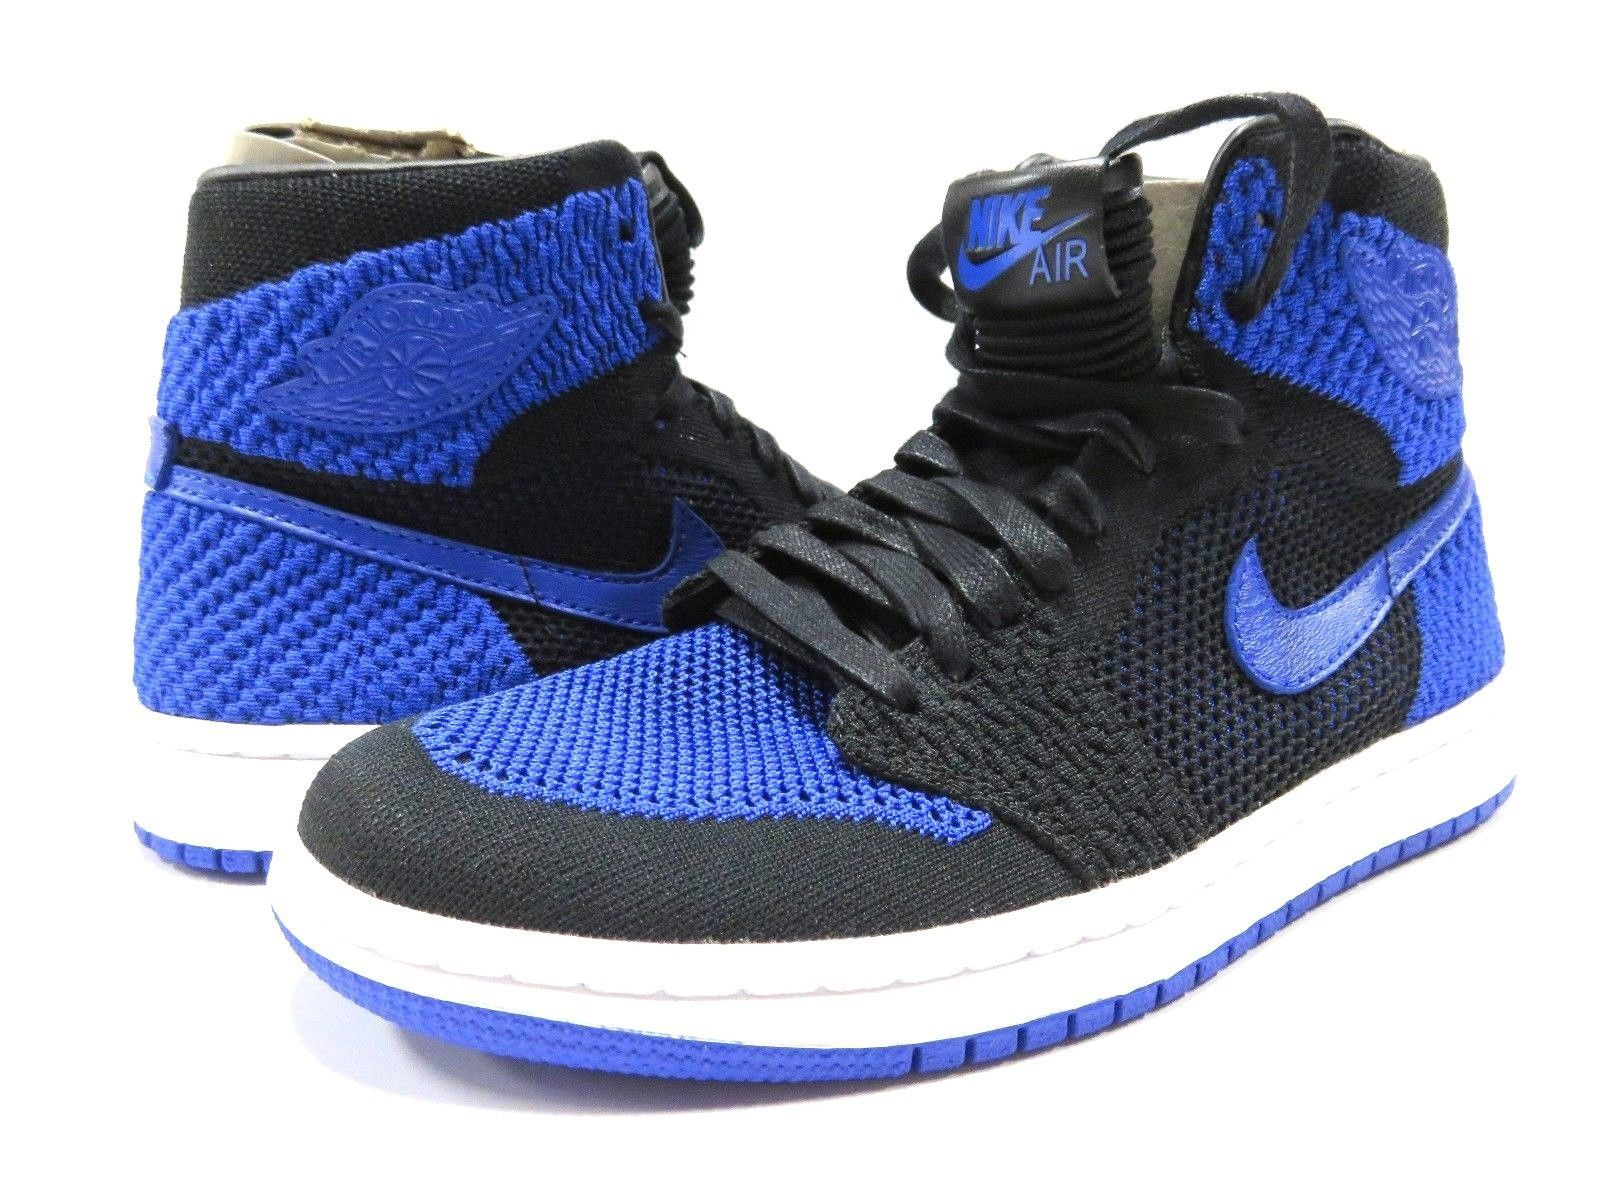 57a35f9cb514 NWB Nike Air Jordan Retro Hi Flyknit BG and 50 similar items